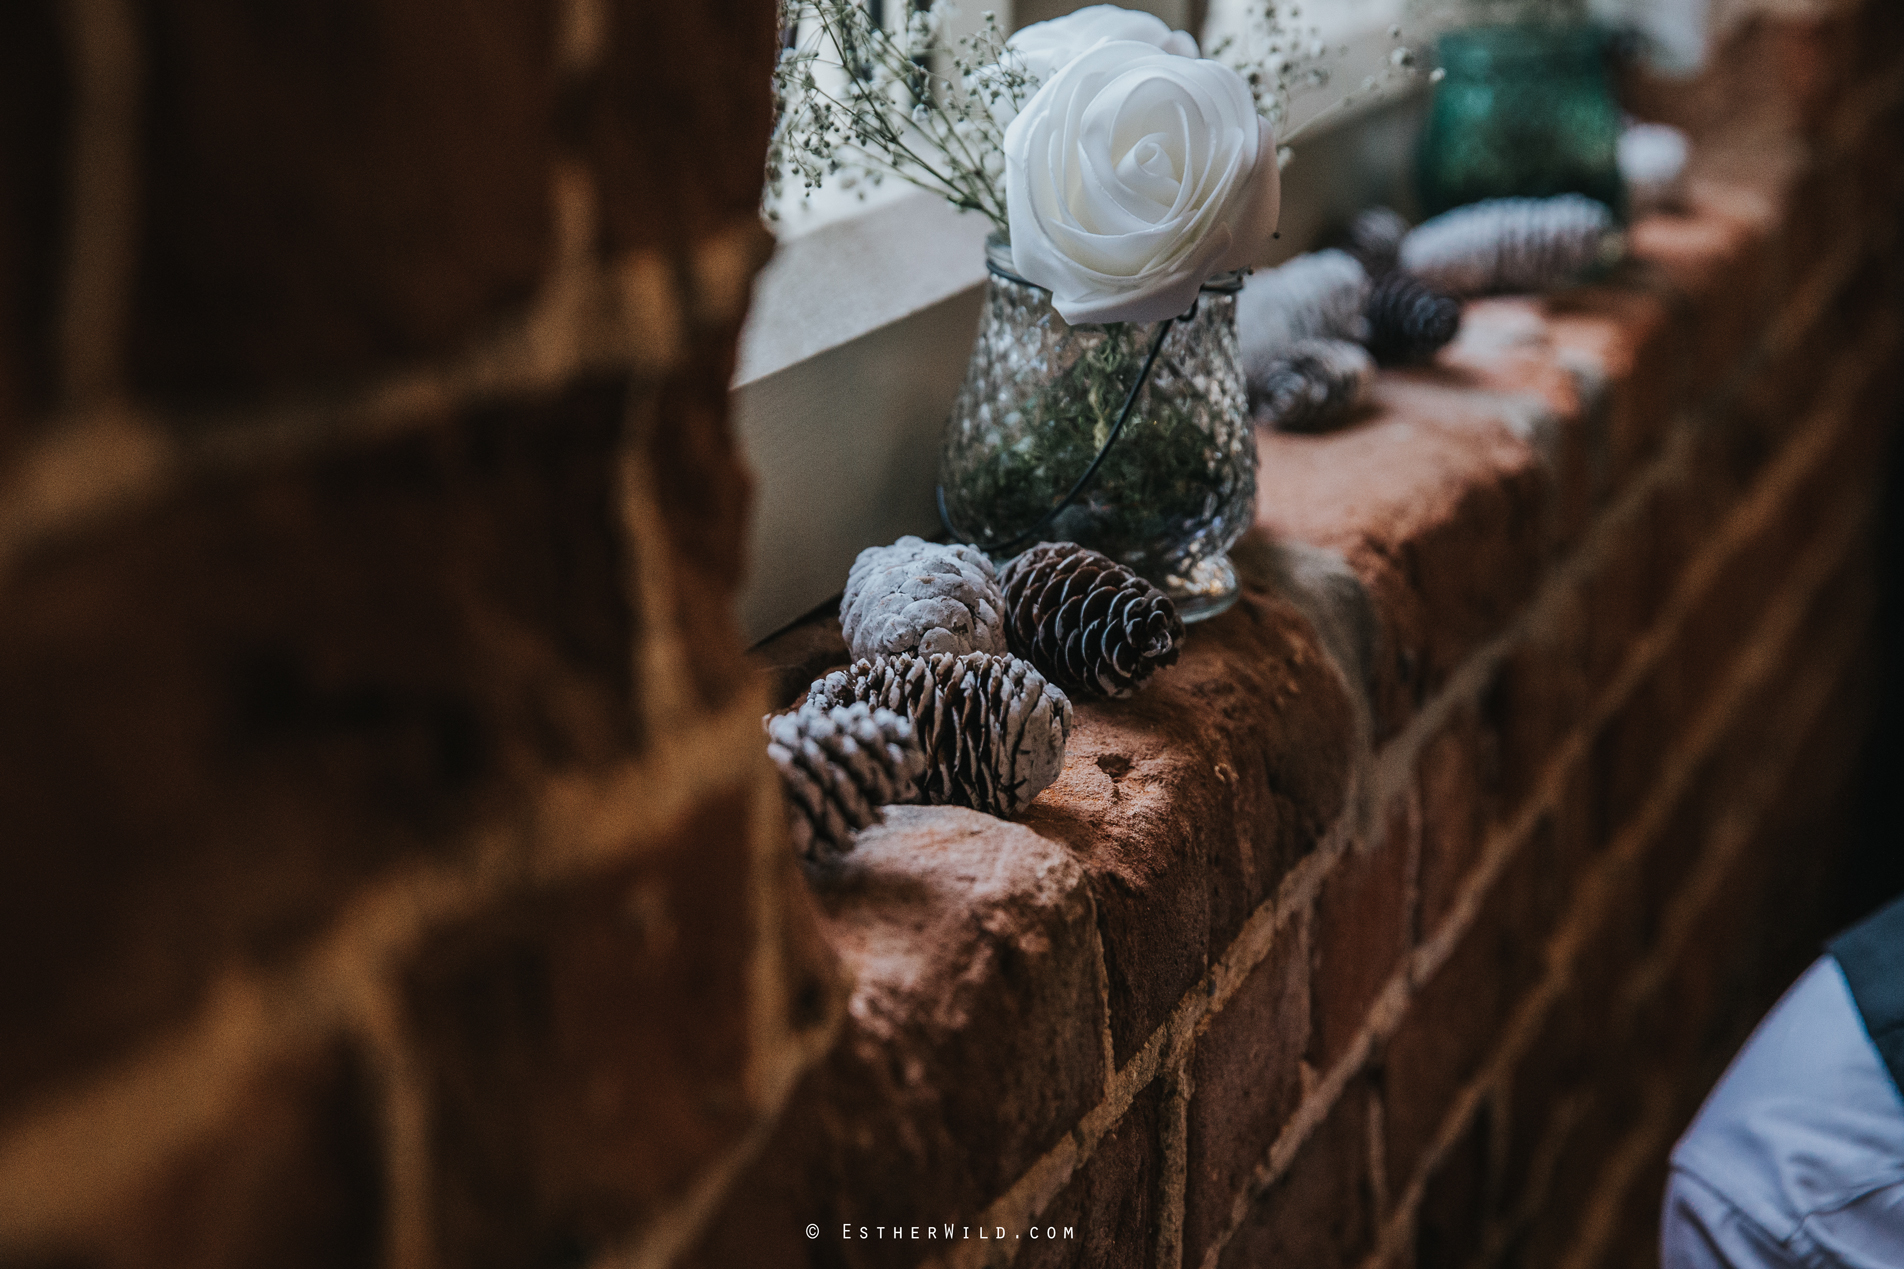 Reading_Room_Weddings_Alby_Norwich_Photographer_Esther_Wild_IMG_1035.jpg